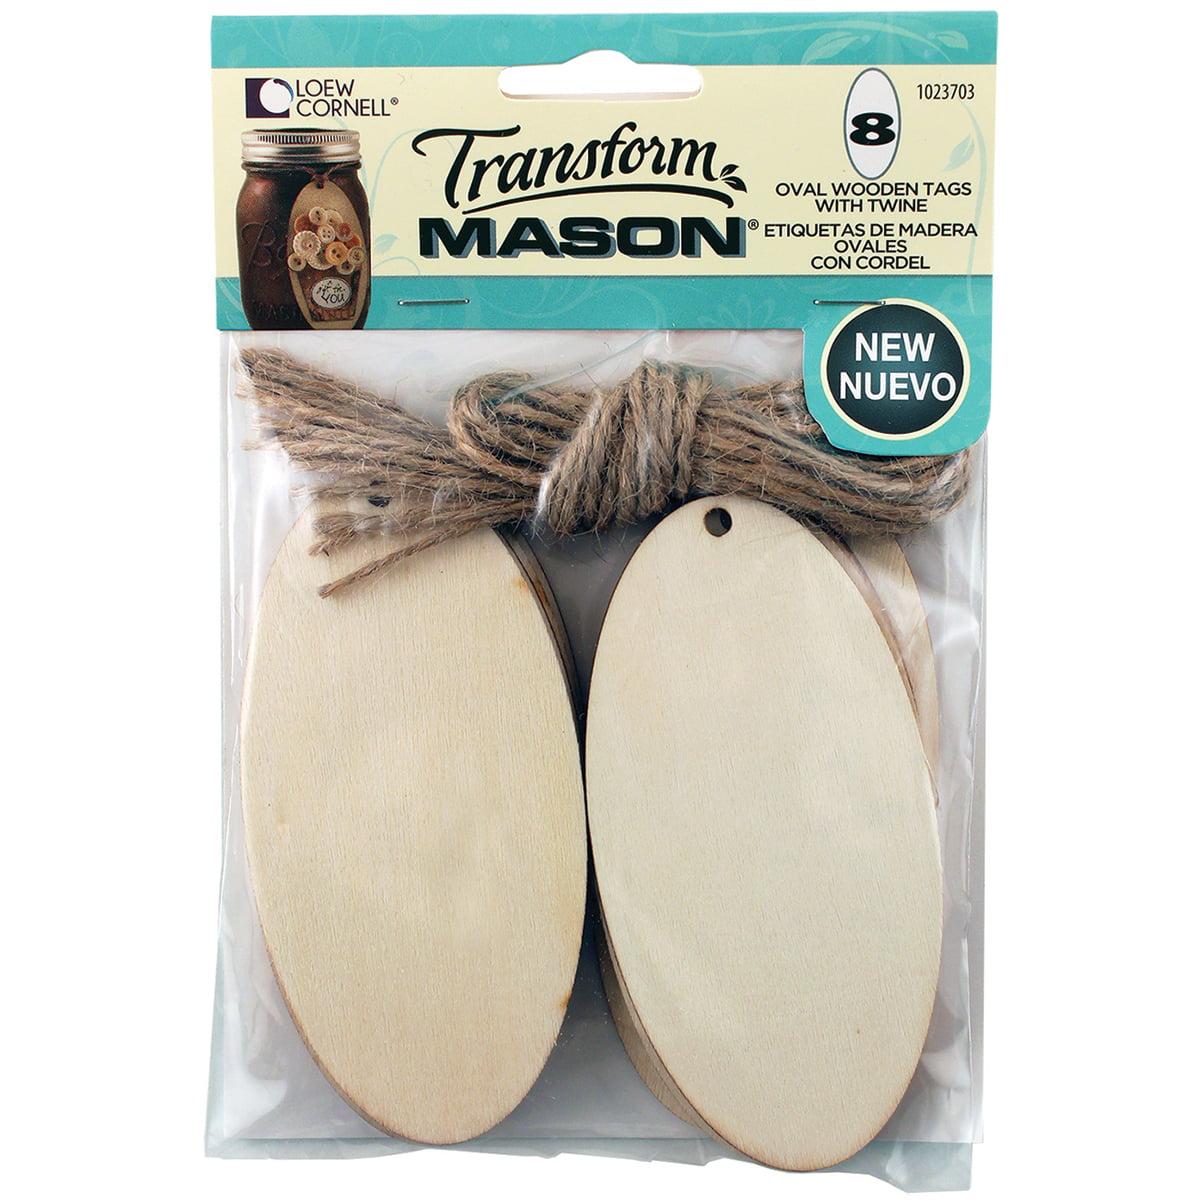 Transform Mason Wooden Tags 8/Pkg-Oval